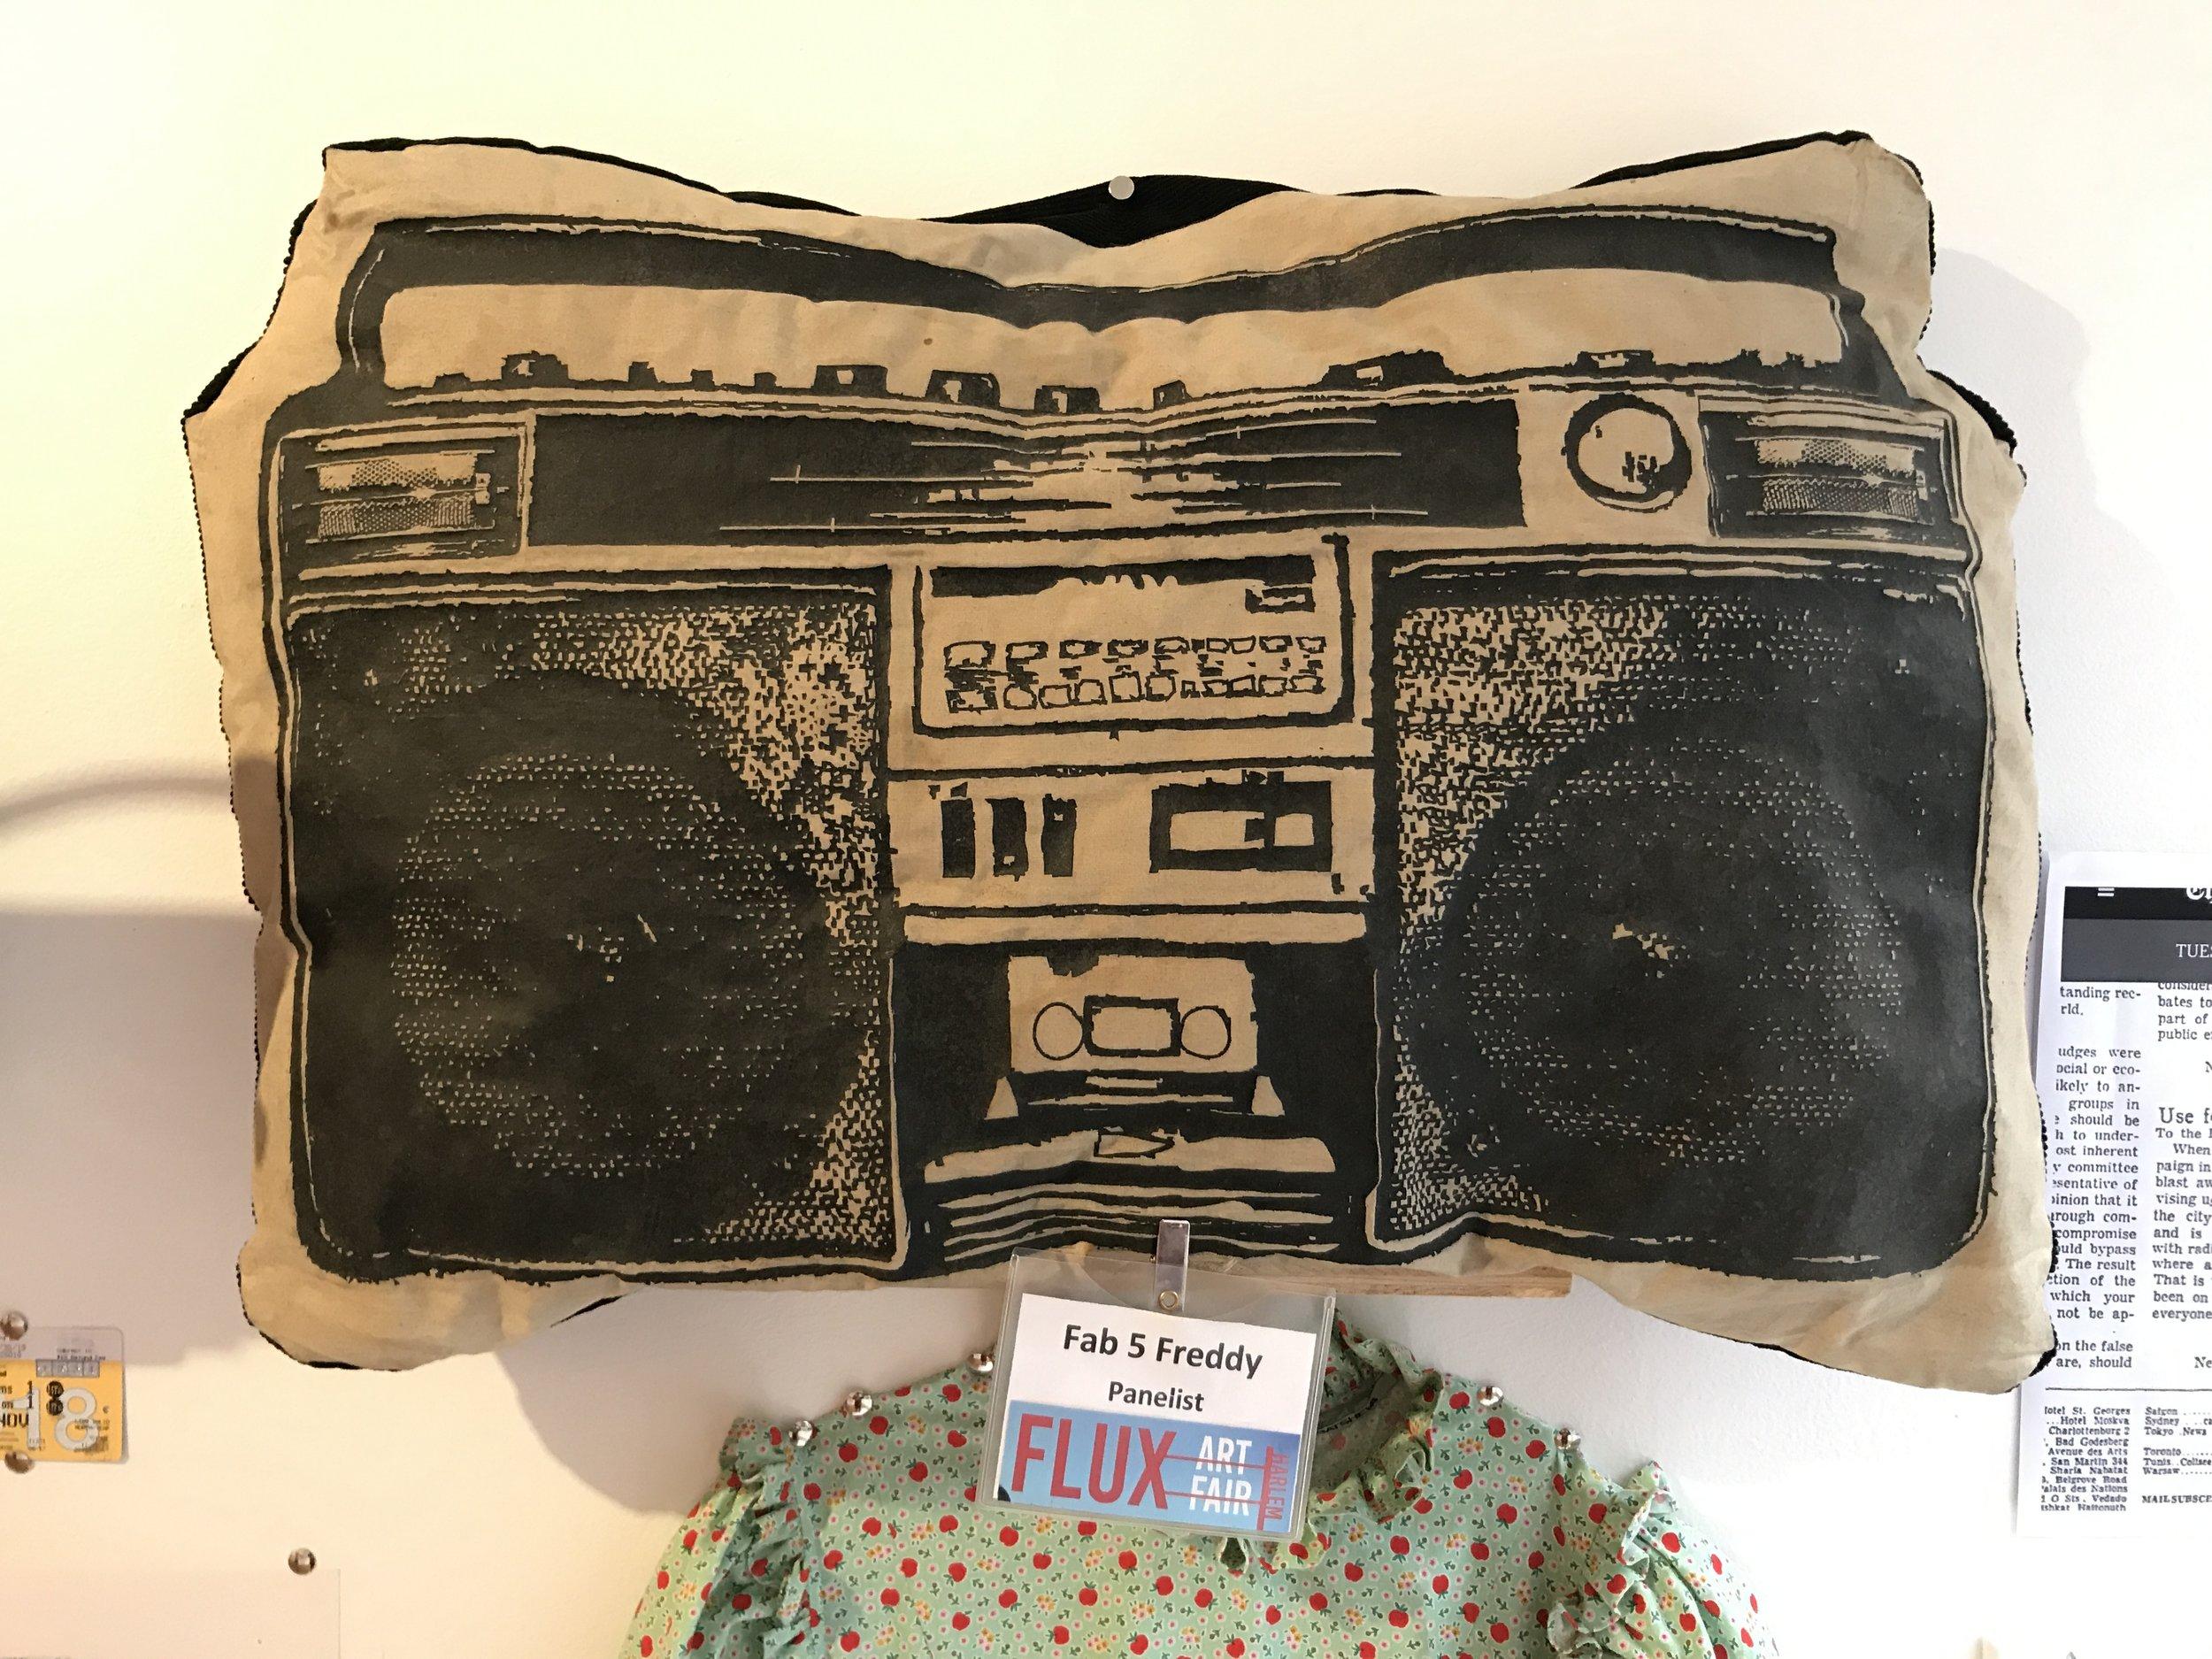 Boombox pillow + Art in Flux badge (Fab 5 Freddy, Artist)